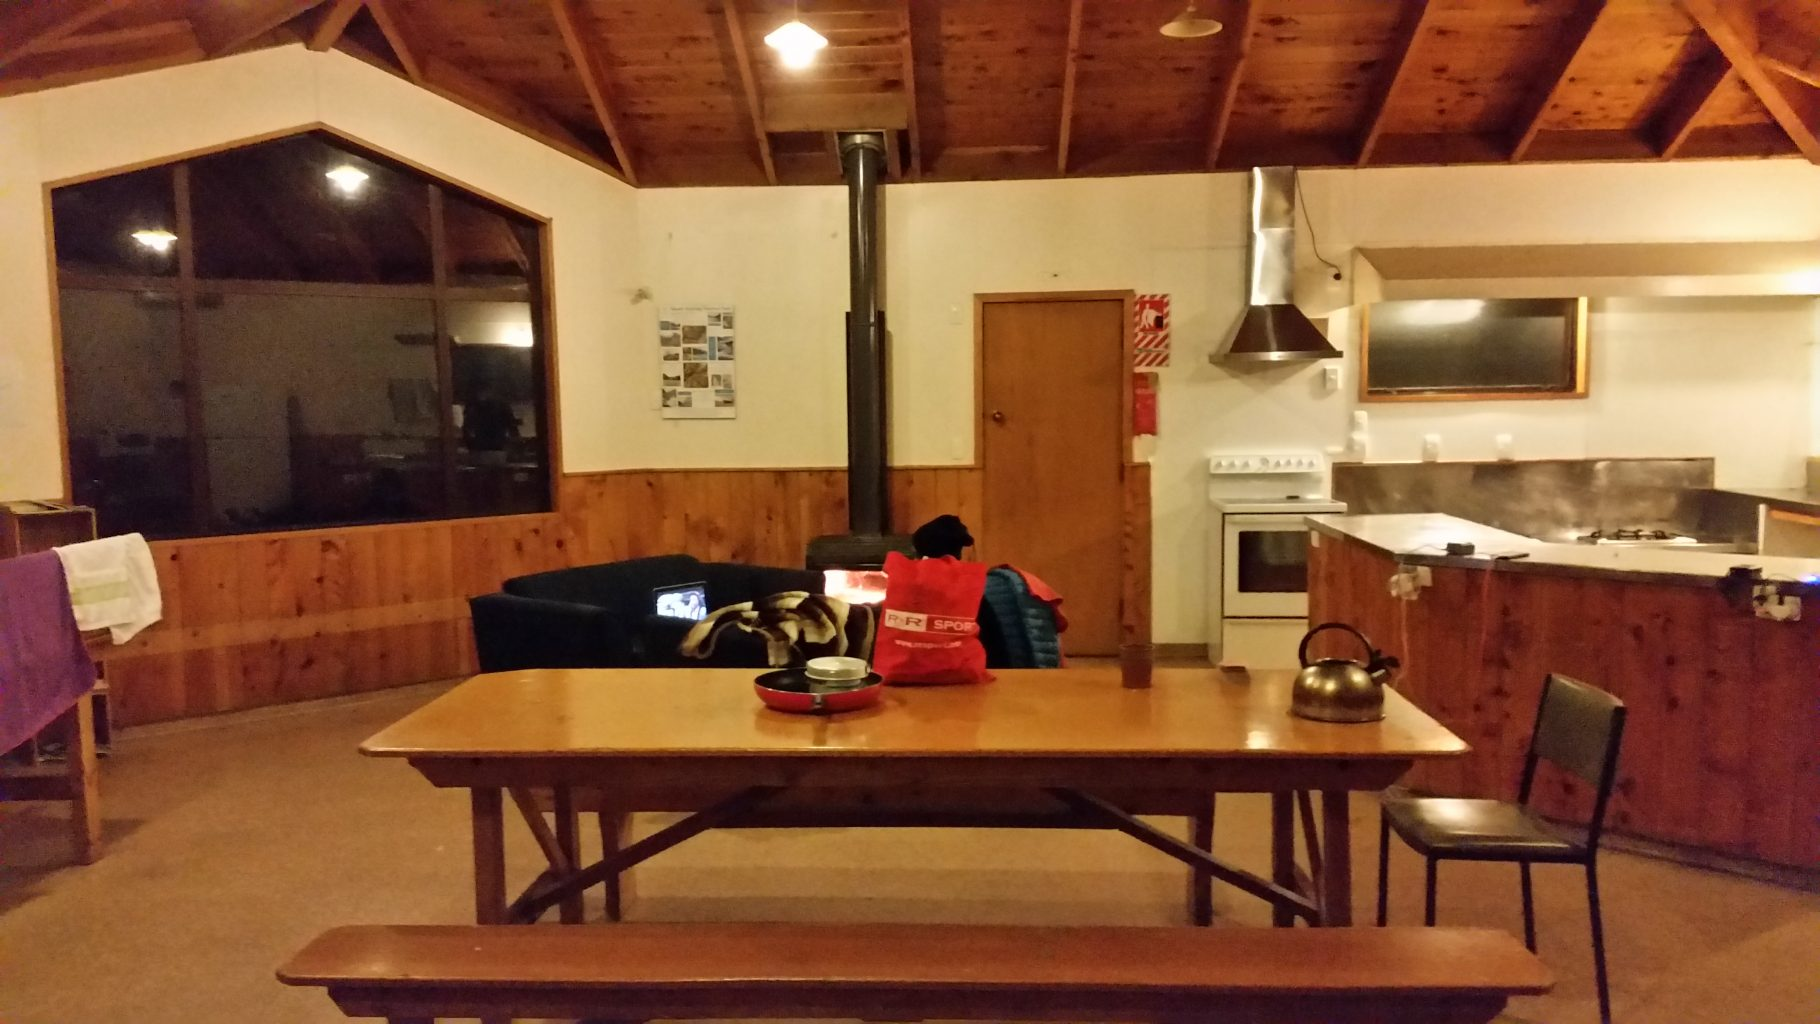 New Zealand Road trip hostel kitchen, driving in new zealand